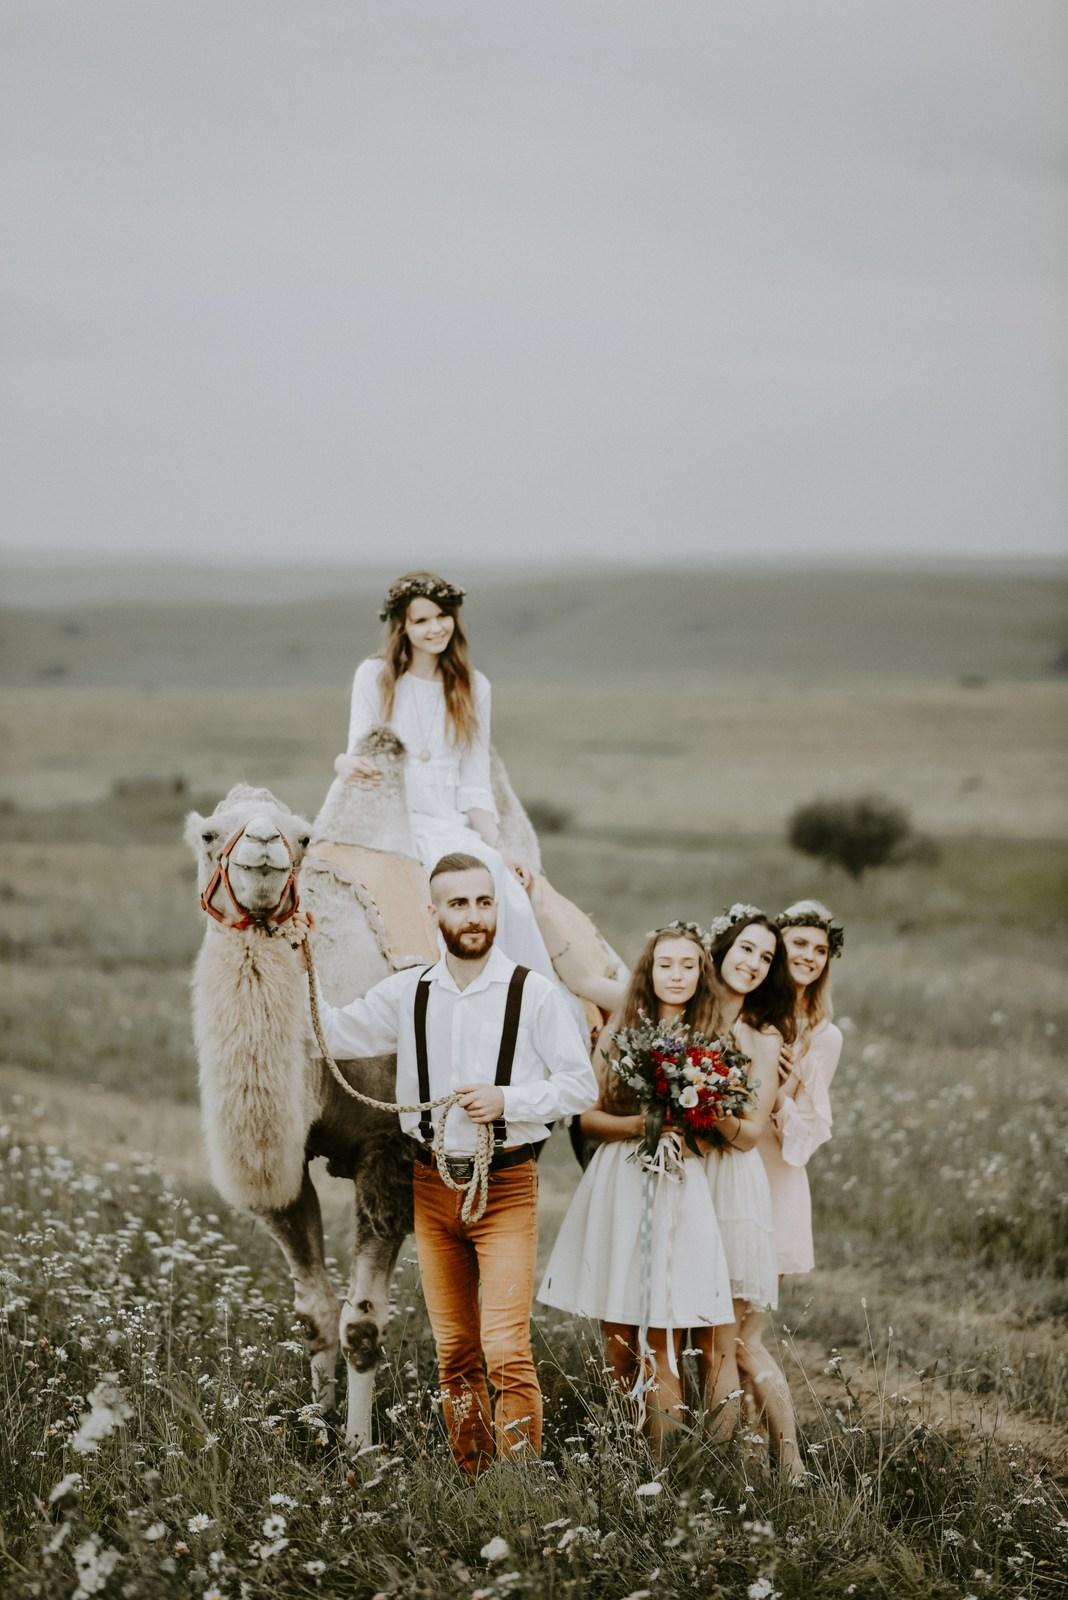 Дух свободы: бохо-воркшоп на Кавказе